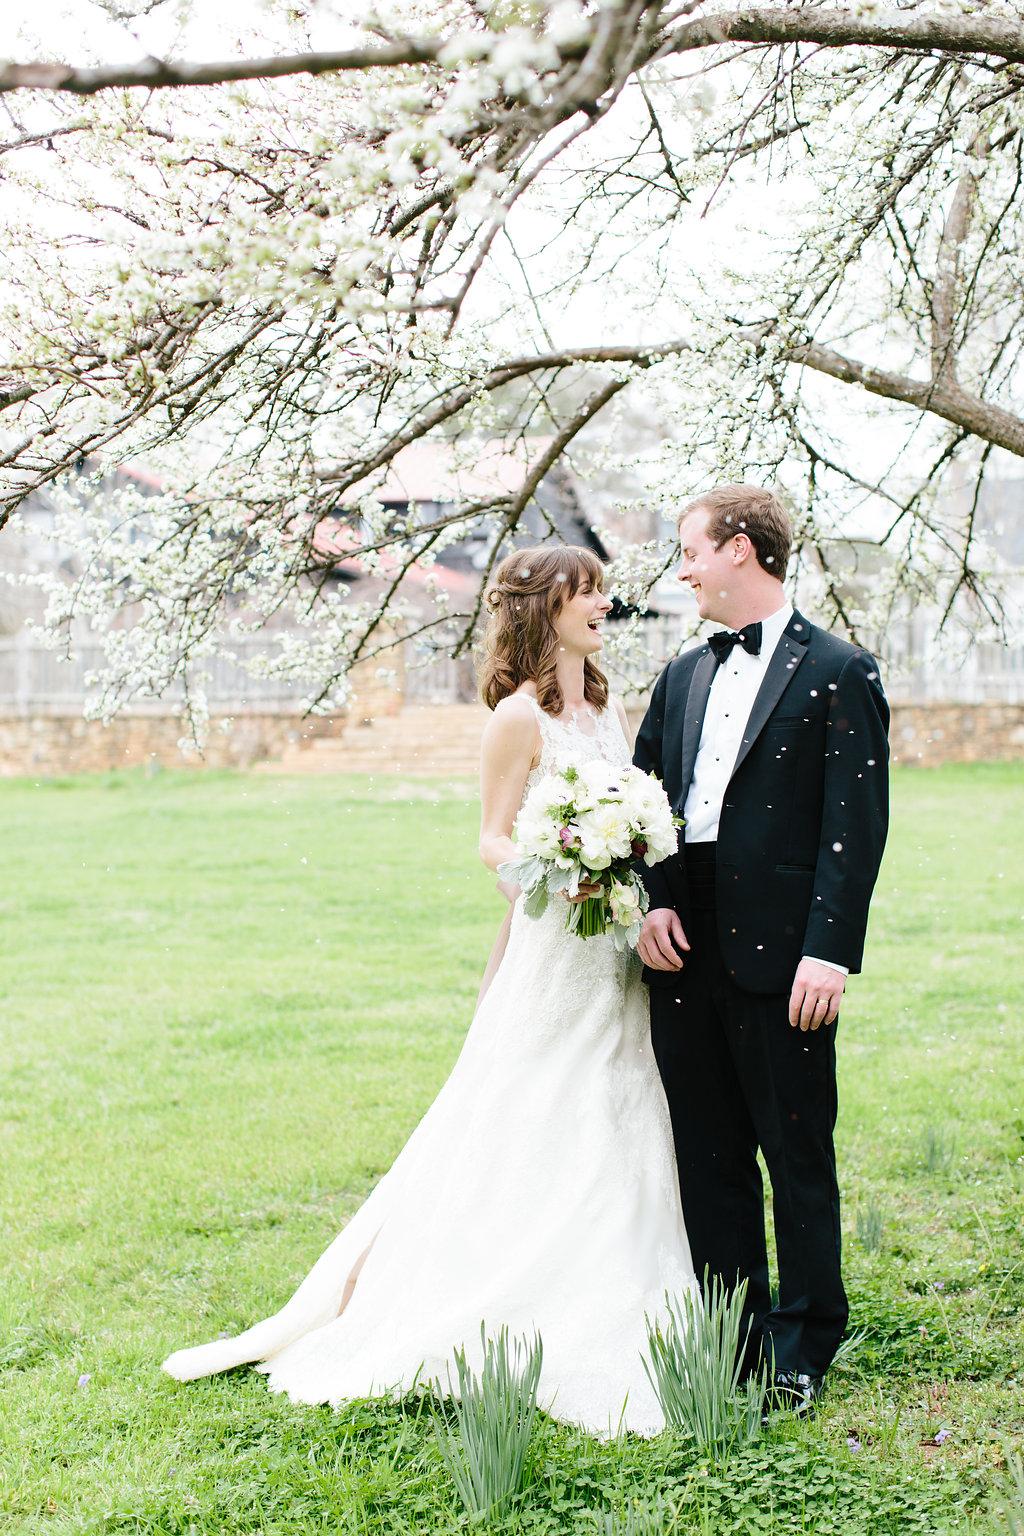 Inn at Serenbe, Palmetto GA wedding planner